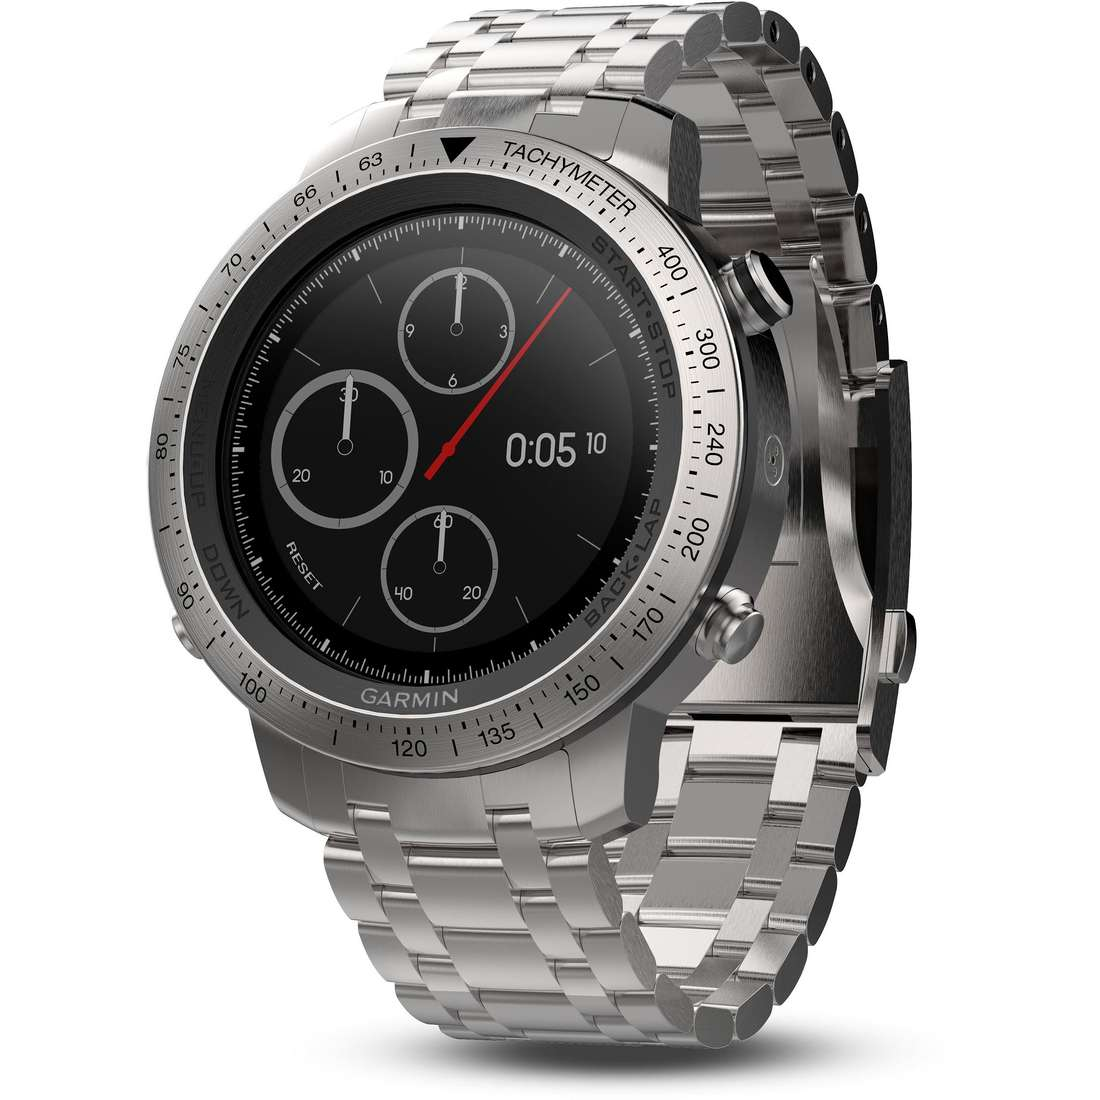 watch Smartwatch man Garmin 010-01957-02